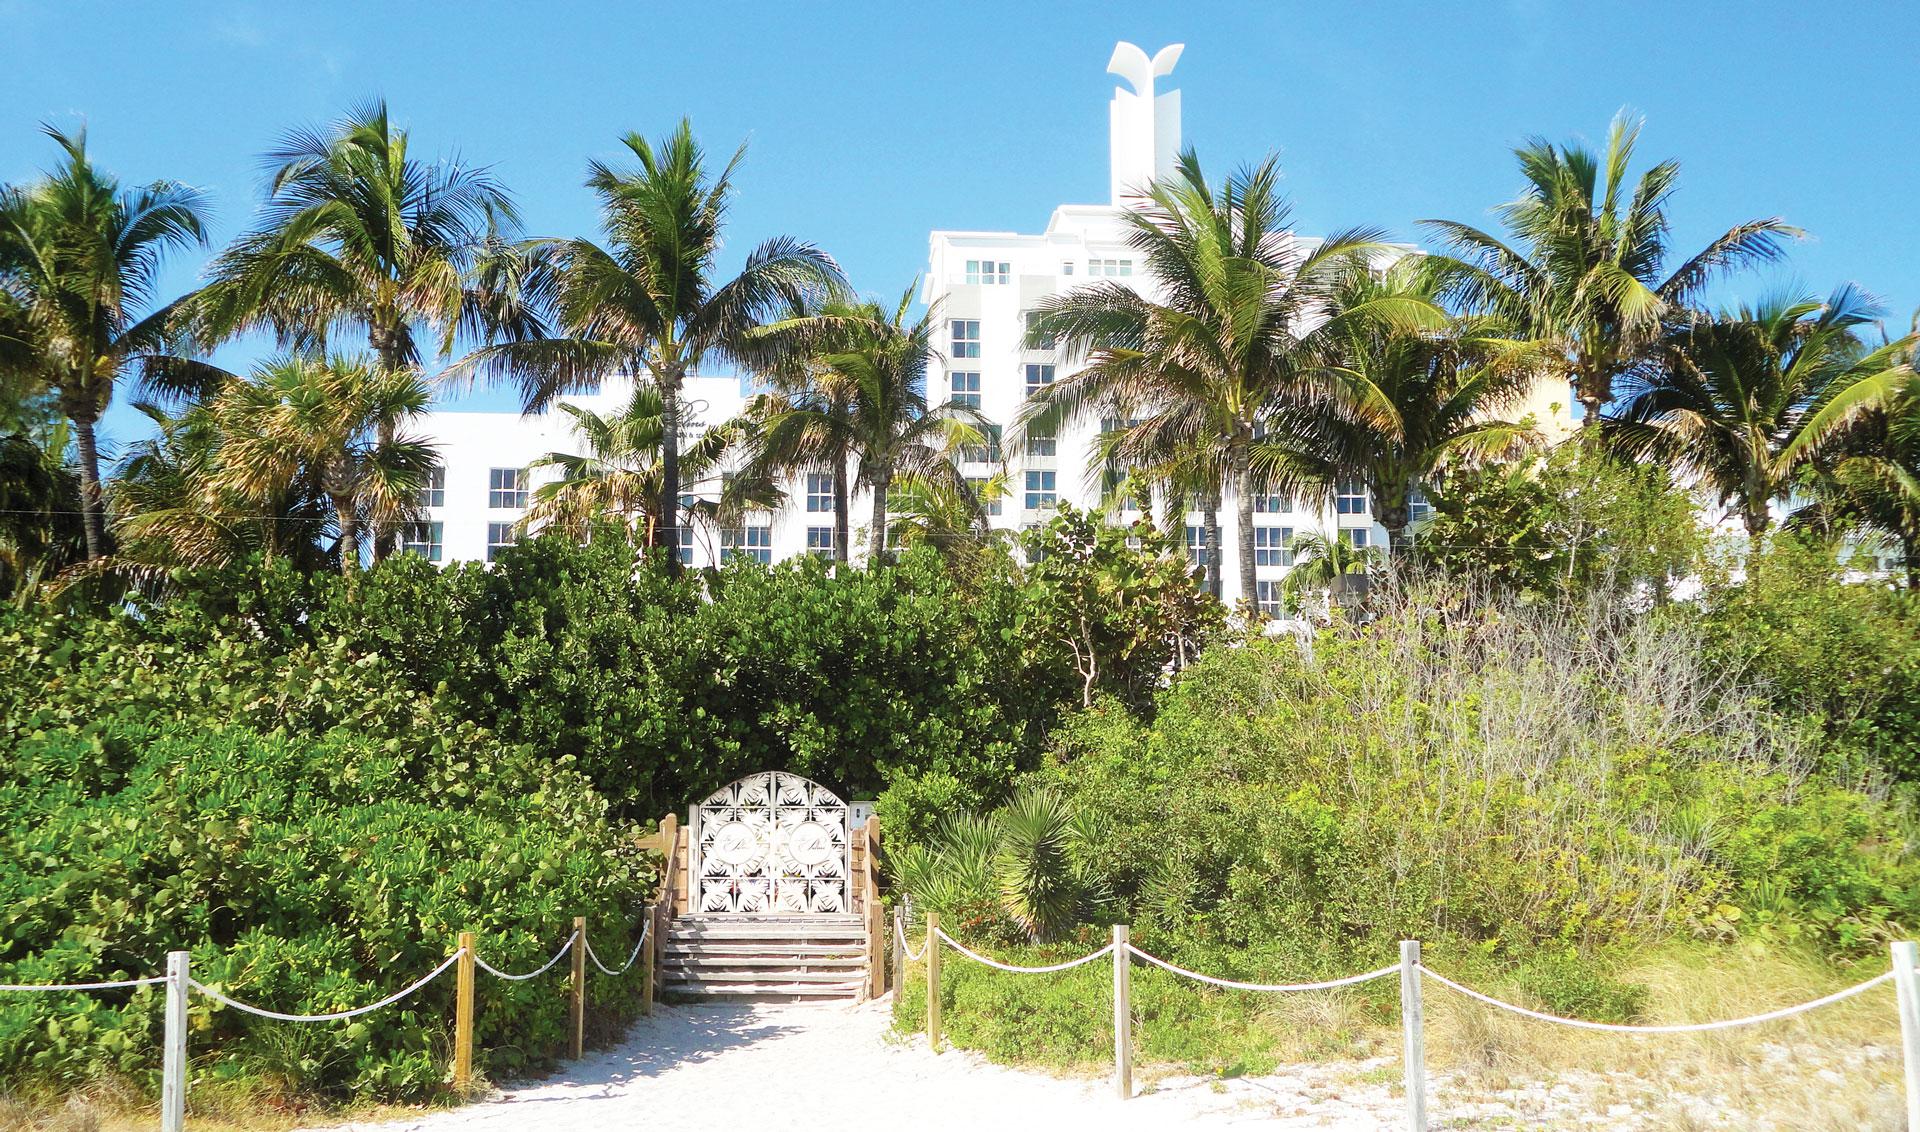 The Palms Hotel & Spa | Miami Beach, Florida